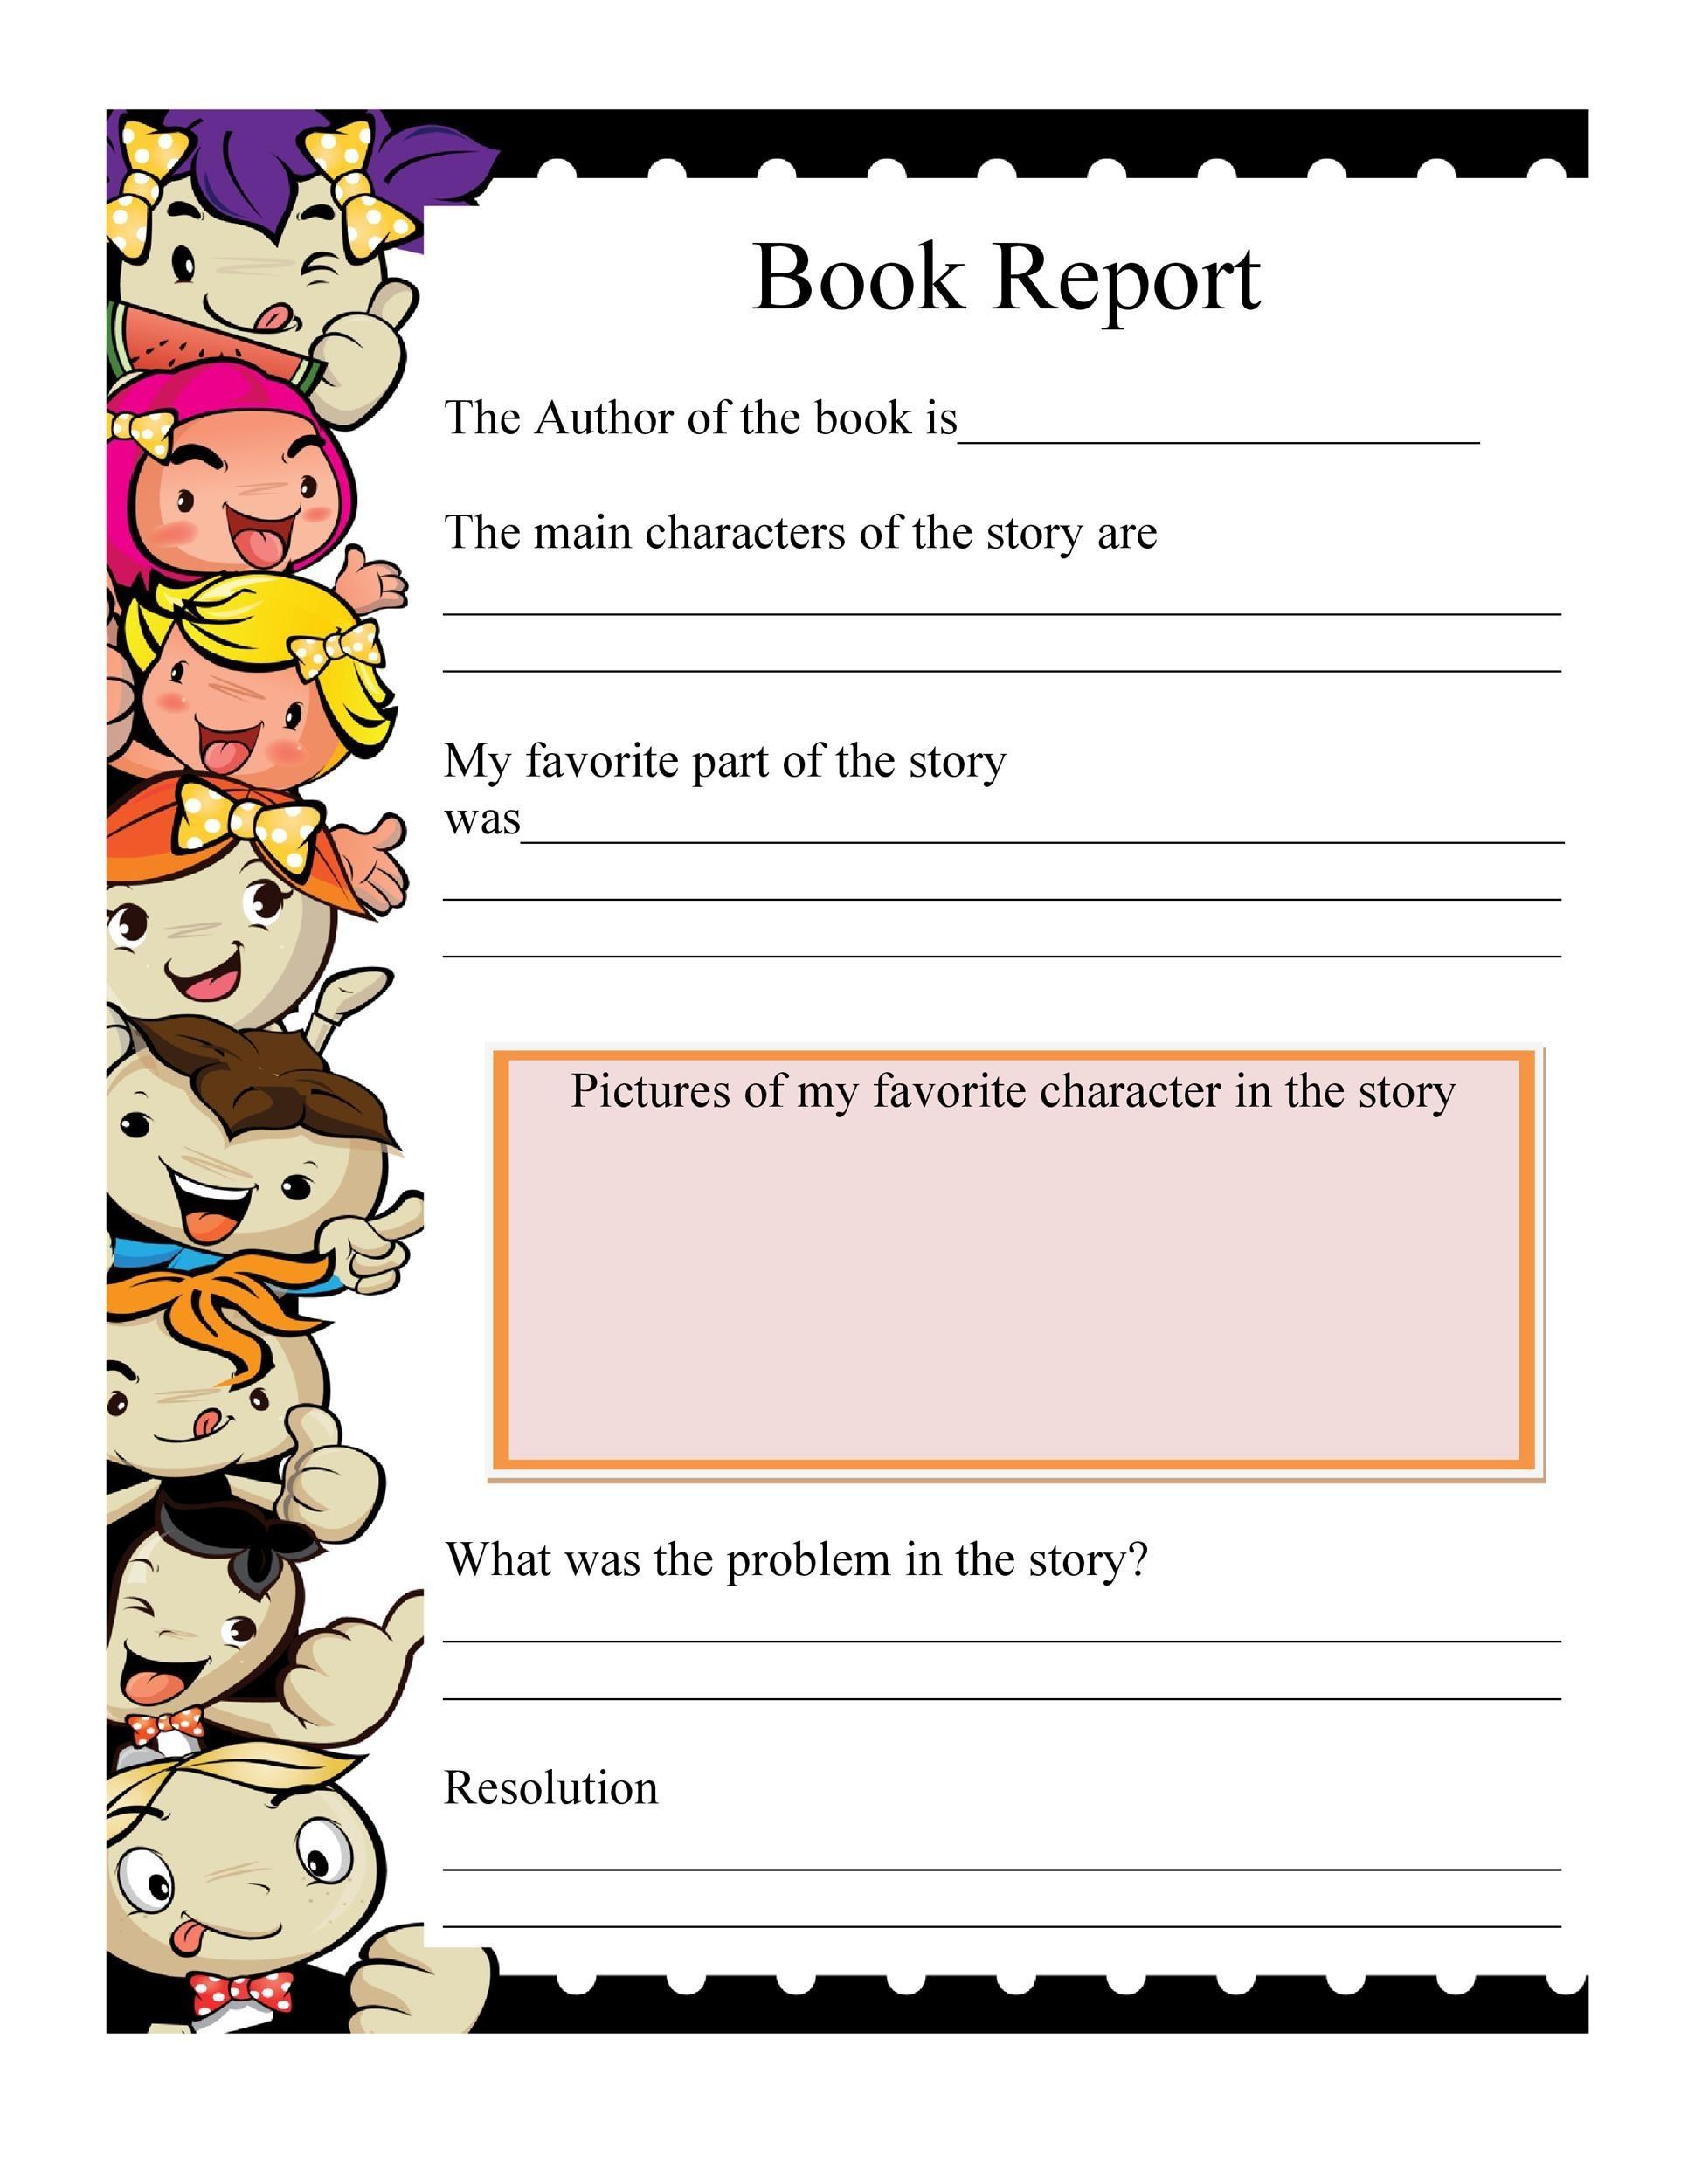 Book report printable templates